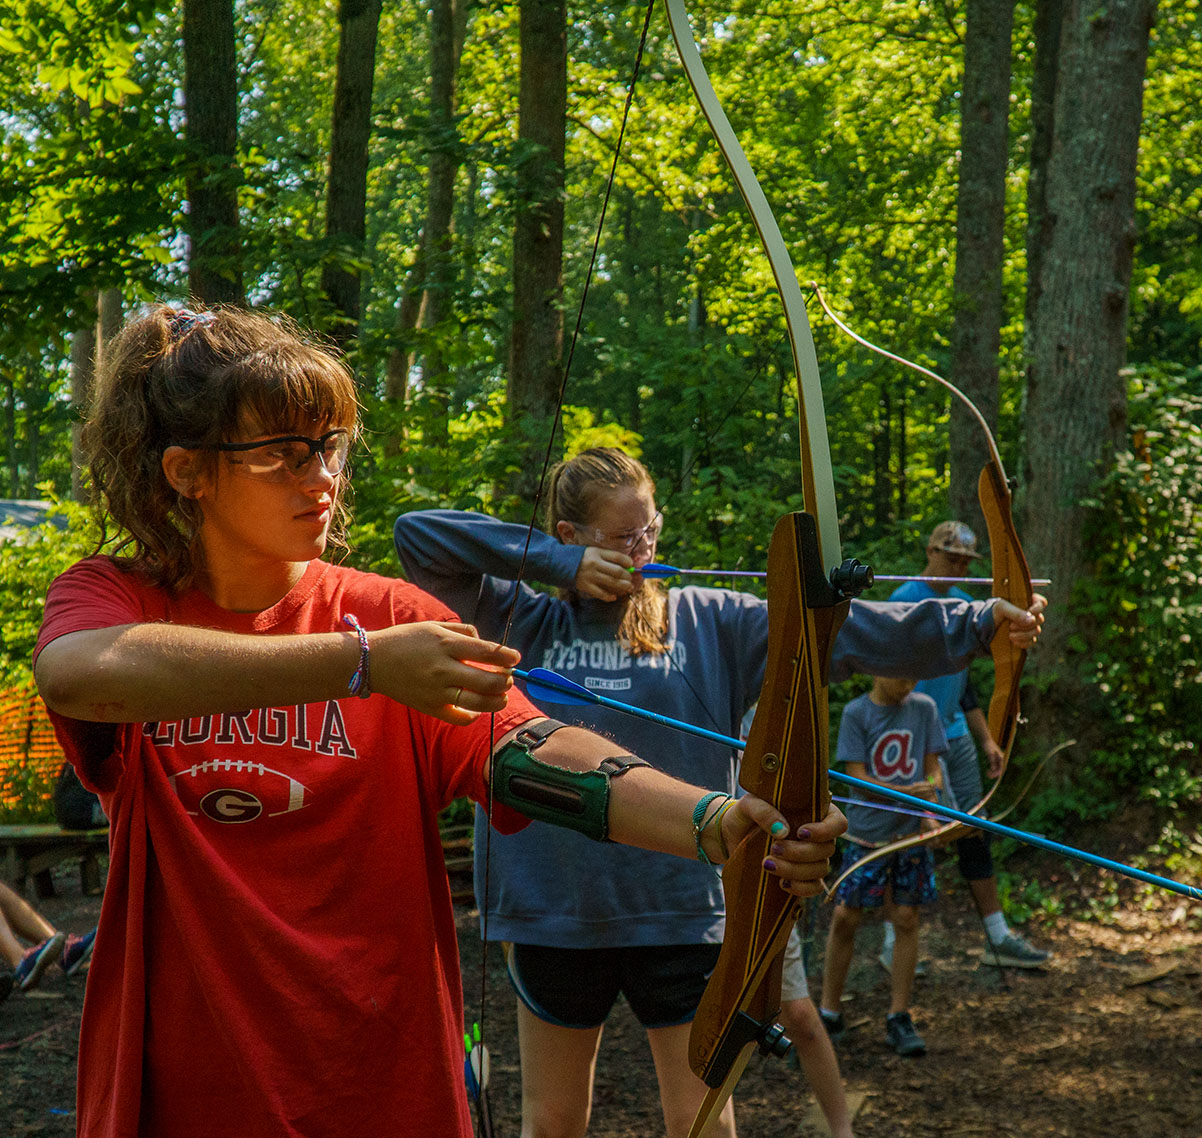 archery_girl.jpg